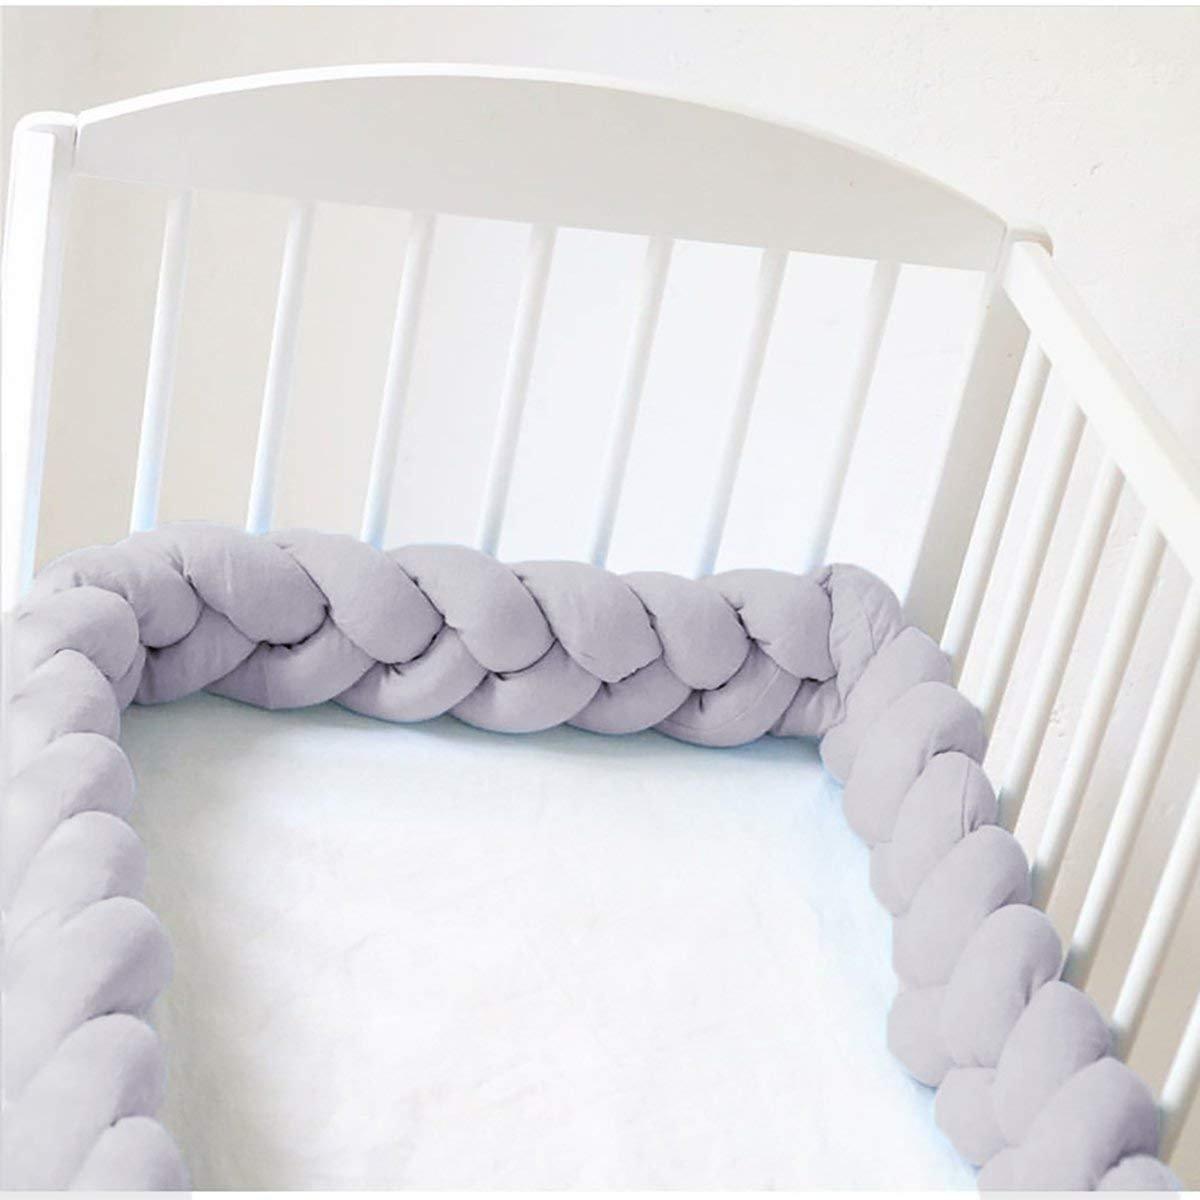 Baby Crib Bumper Knotted Braided Plush 78.7 inch 2m Baby Crib Bumper Knotted Nursery Gift Pillow for Newborns Bed Sleep Bumper (Gray) huahua